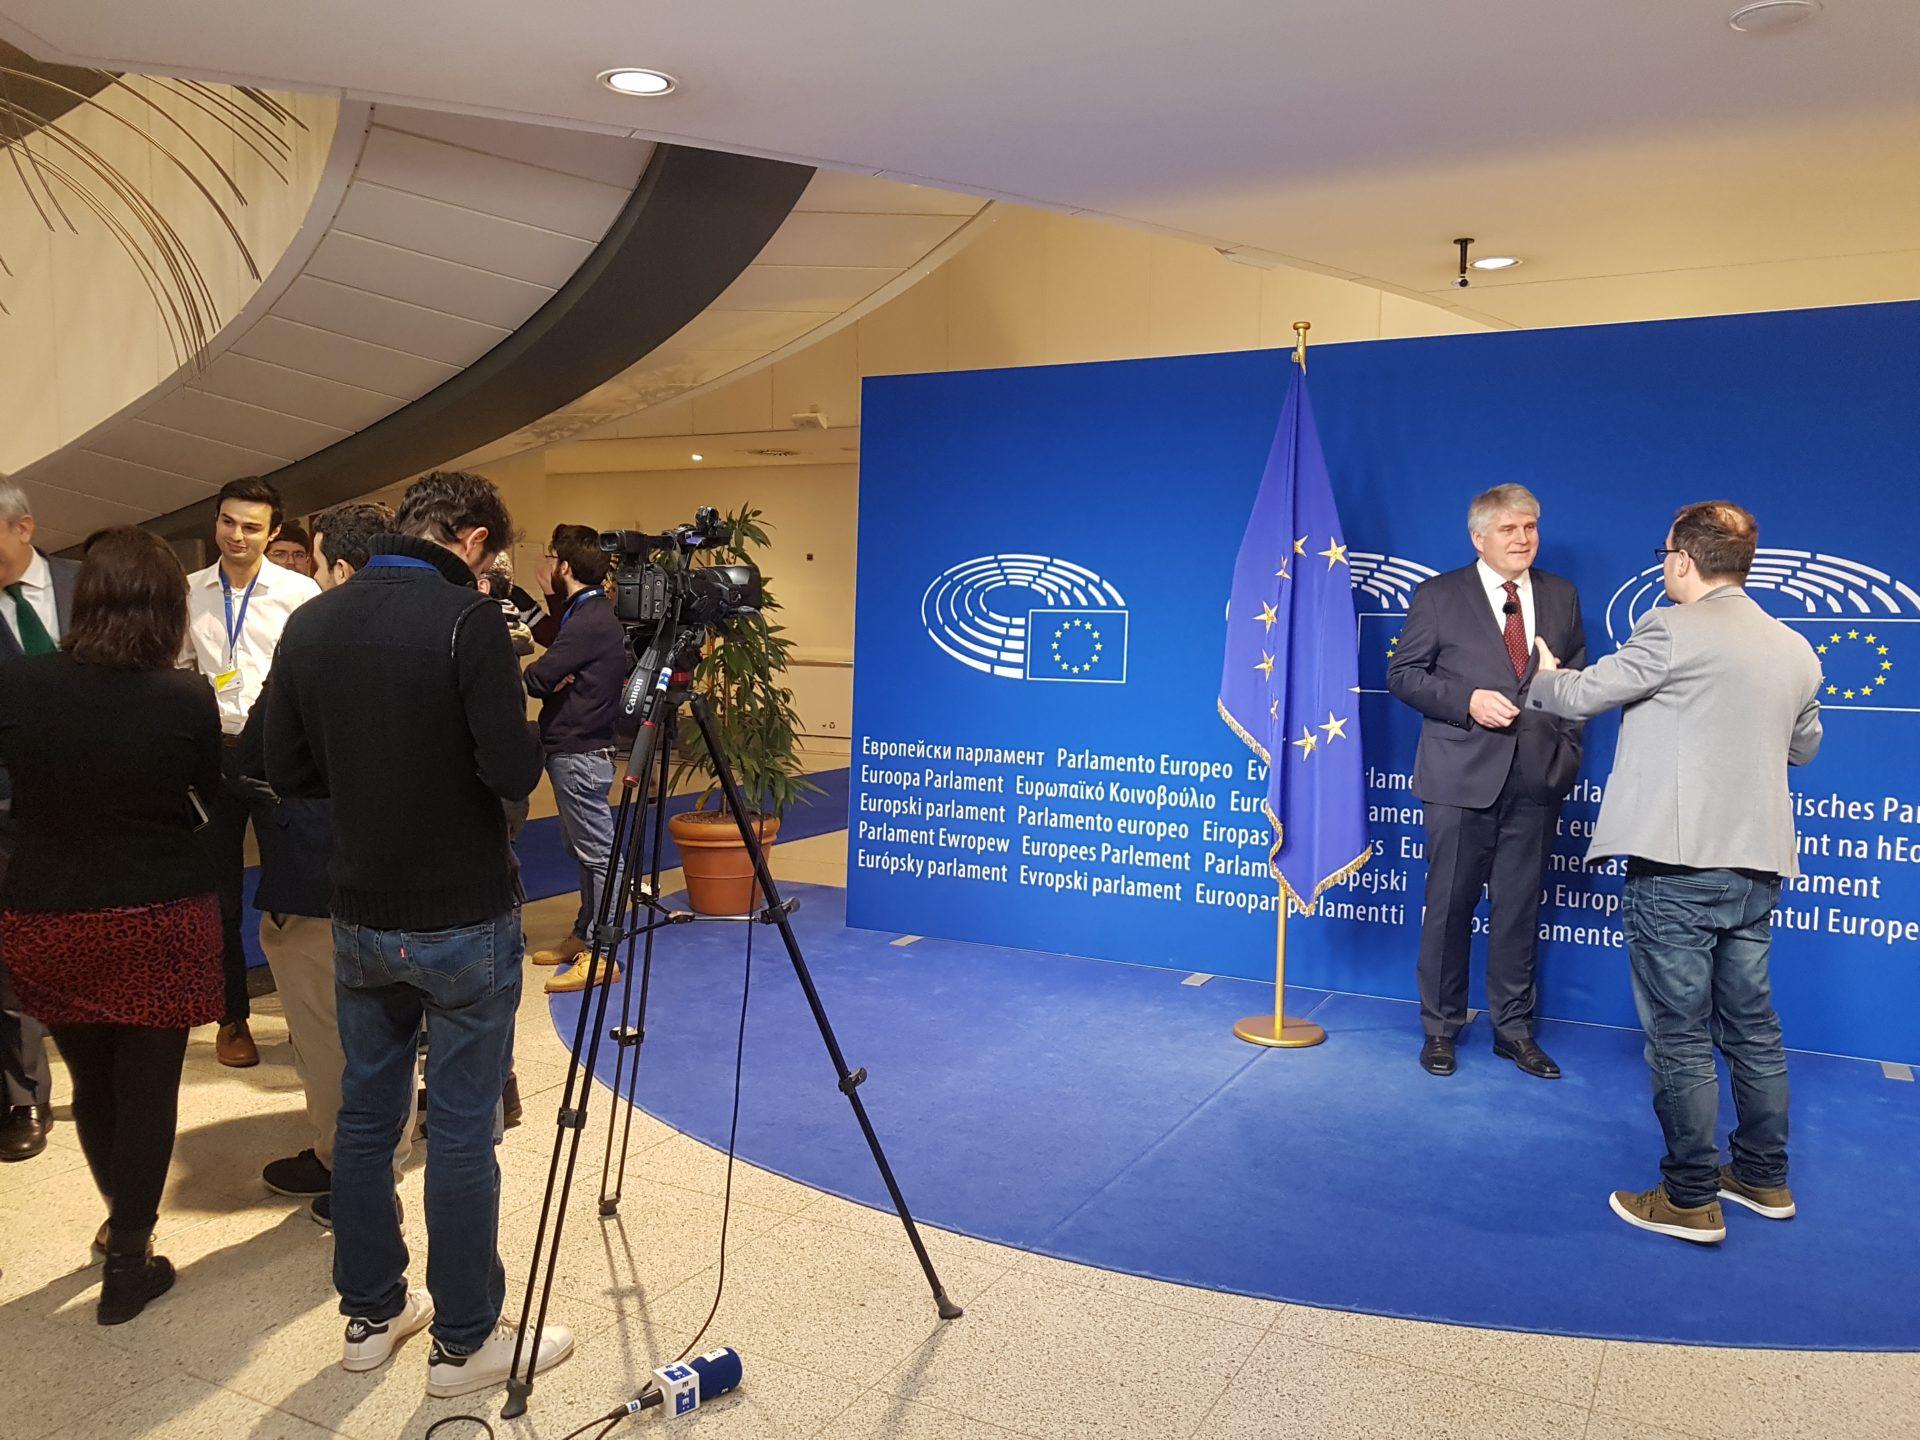 Nils Røkke i EU-parlamentet. Foro: SINTEF Energi/Send Tollak Munkejord